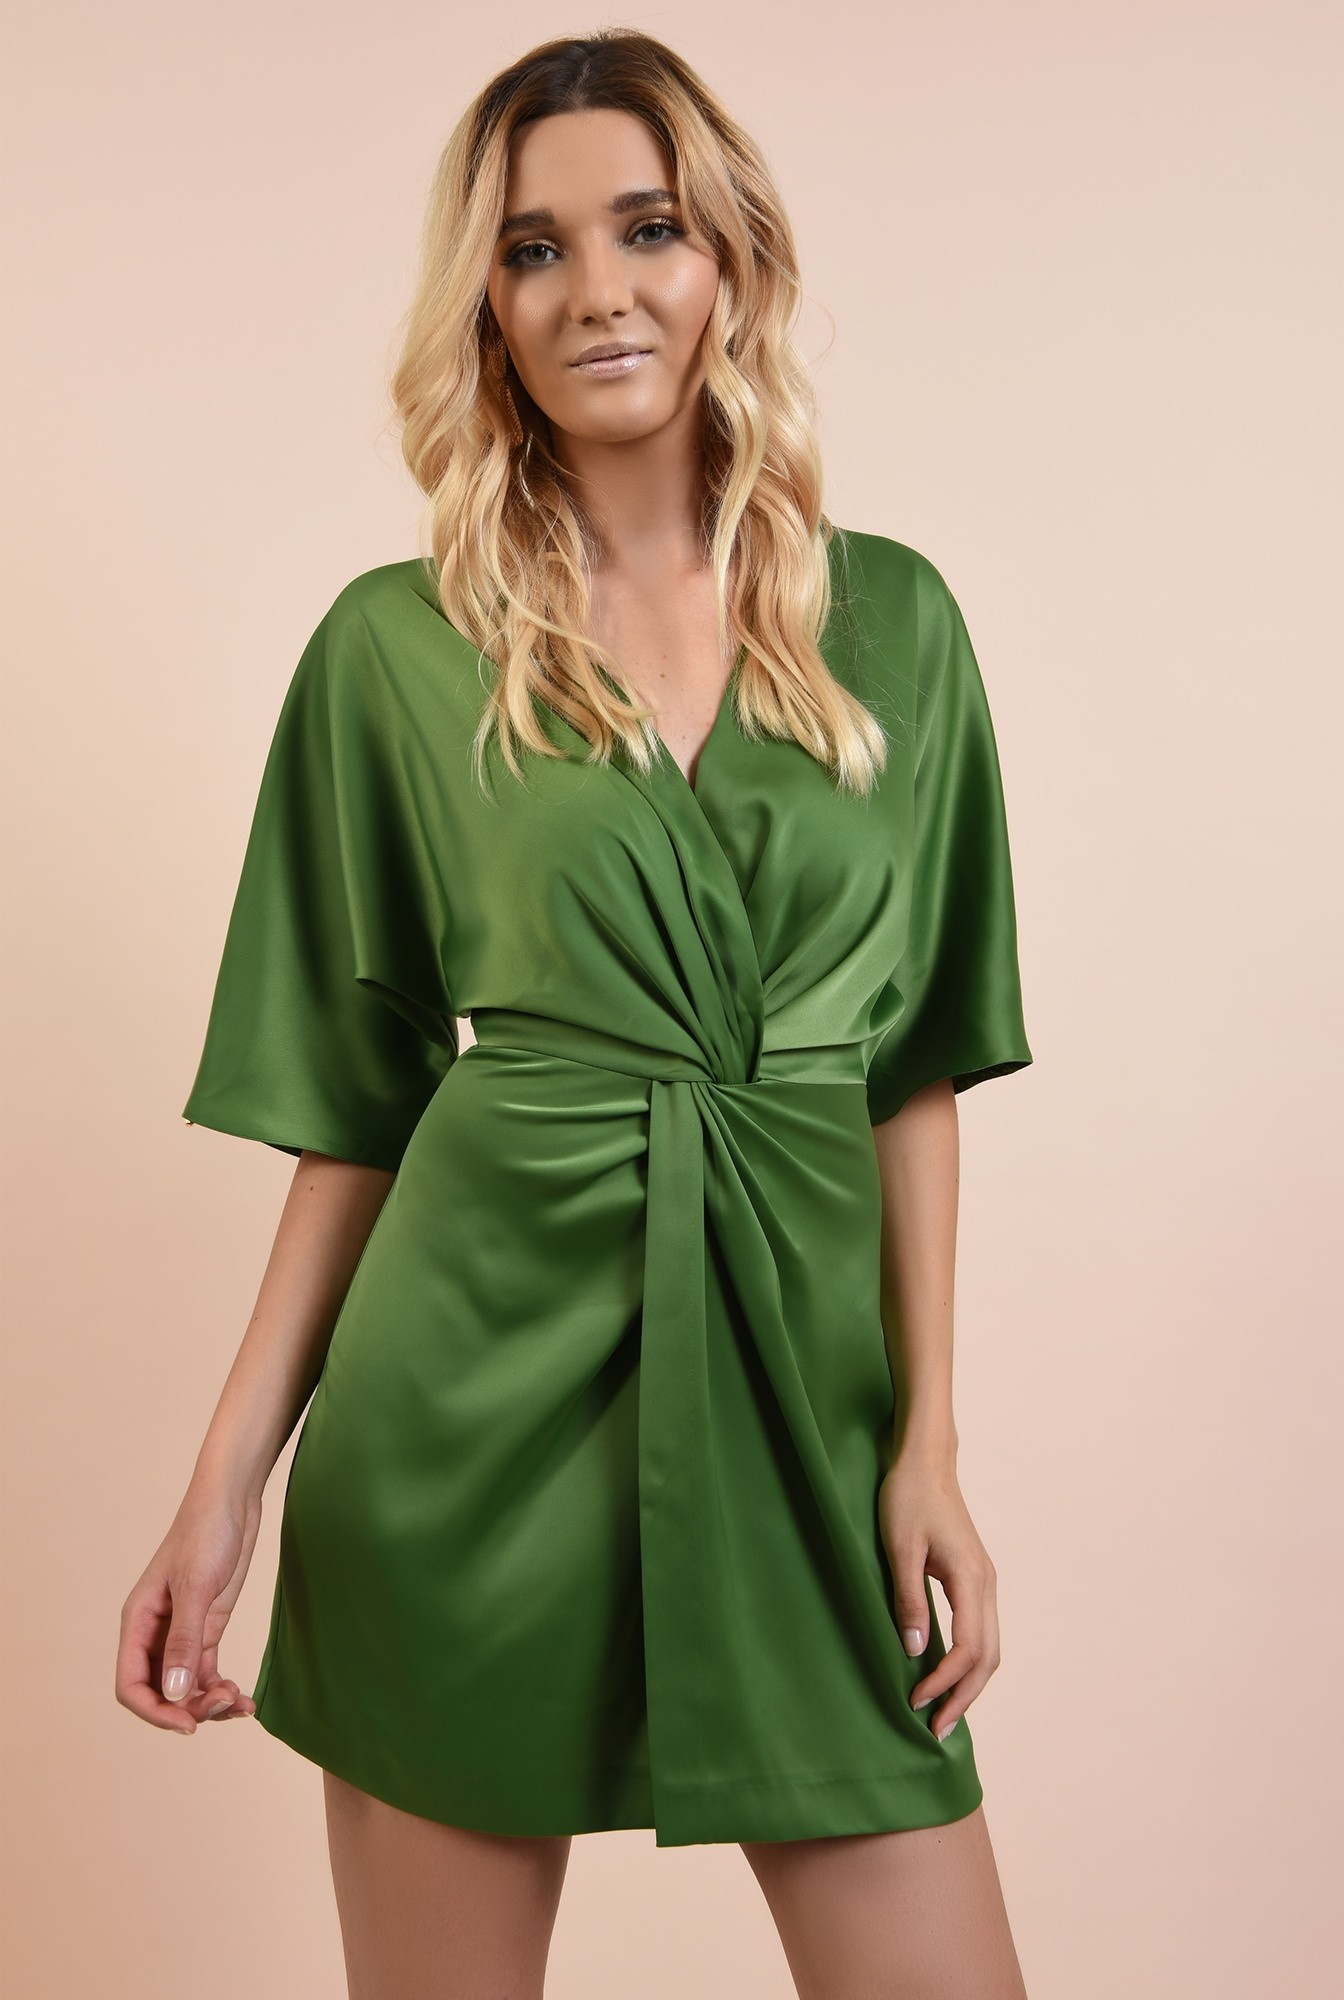 2 - rochie eleganta, verde, din satin, anchior petrecut, talie drapata